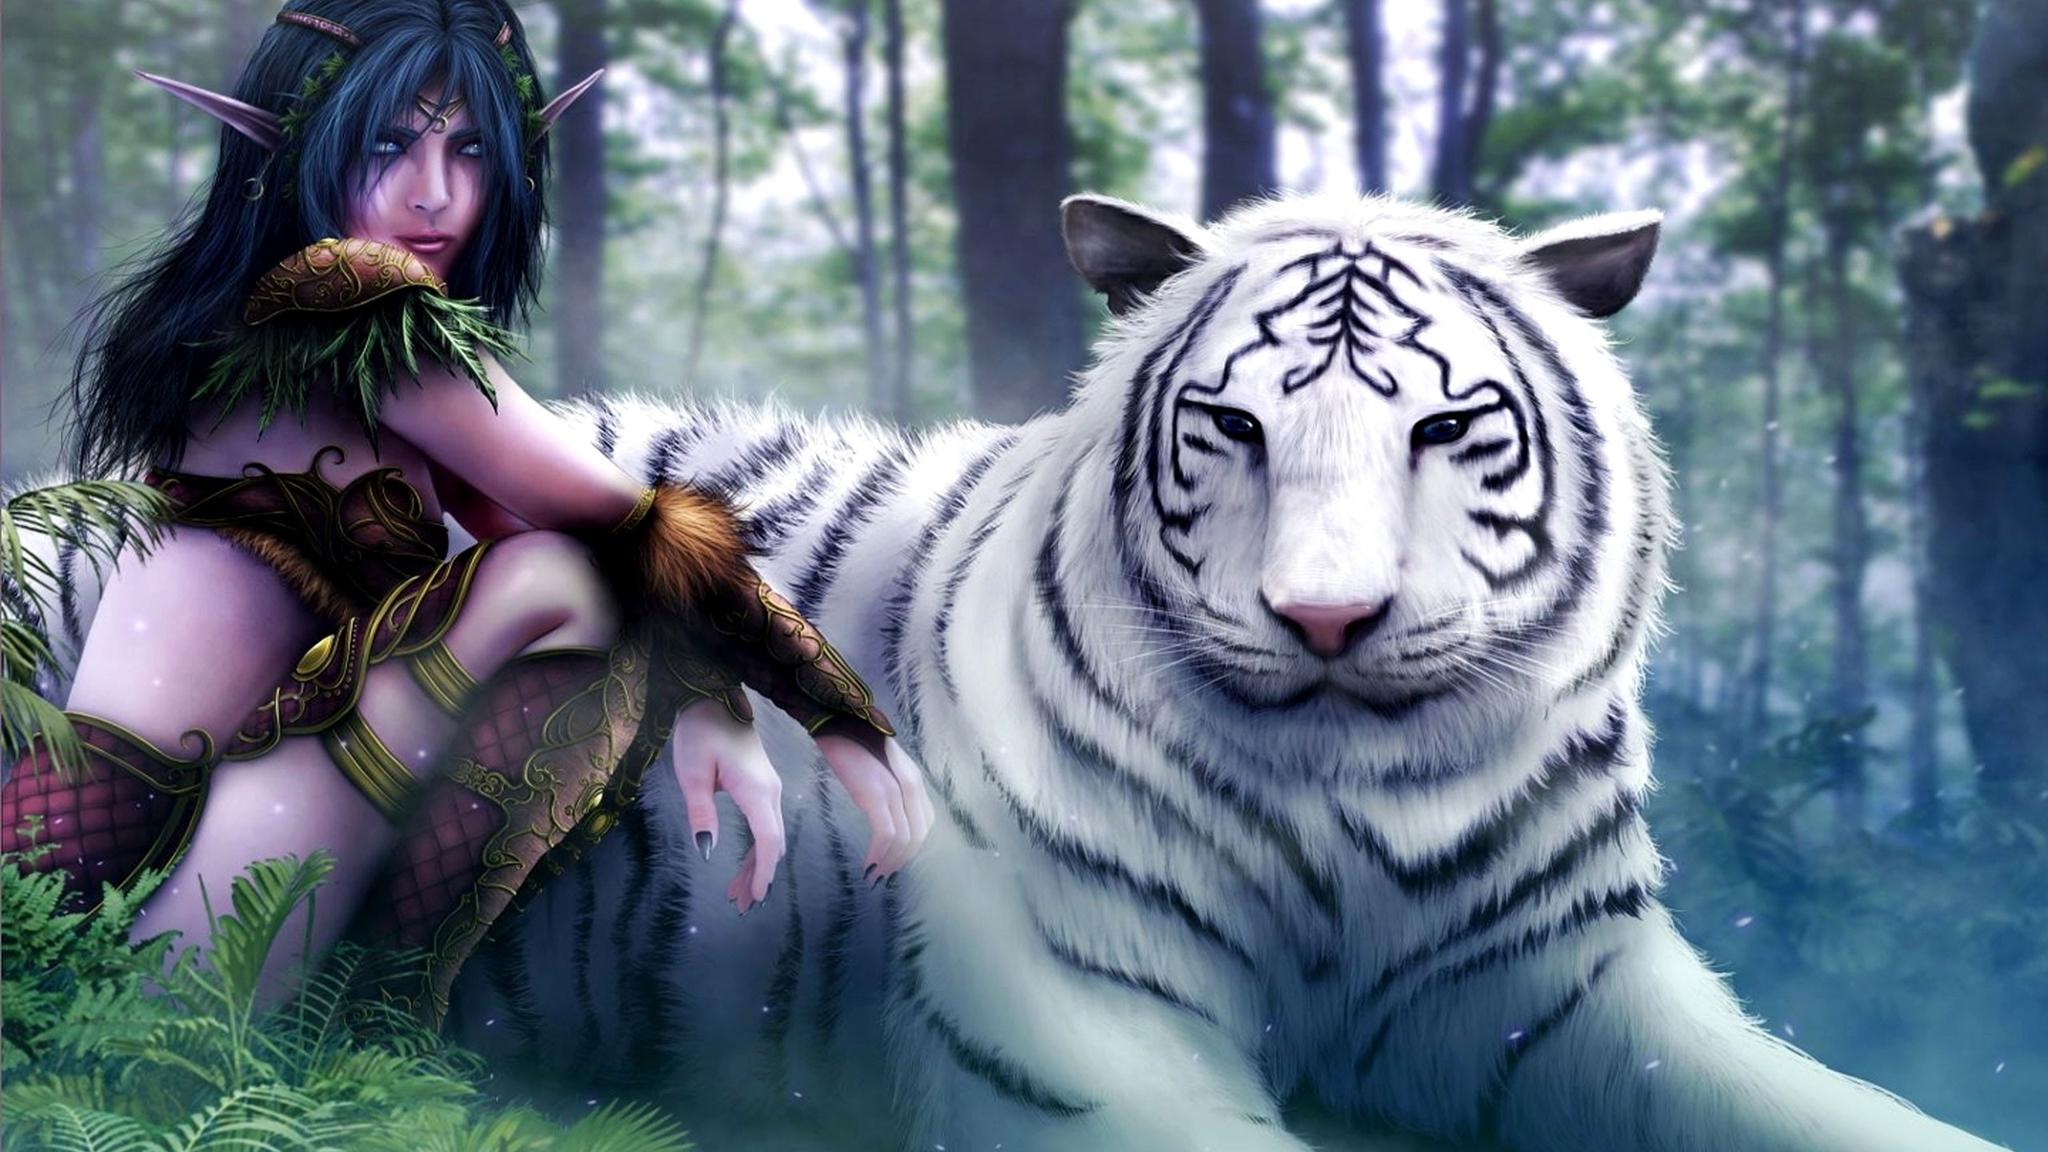 World of warcraft white tiger fantasy art elves artwork drawings (2048x1152)